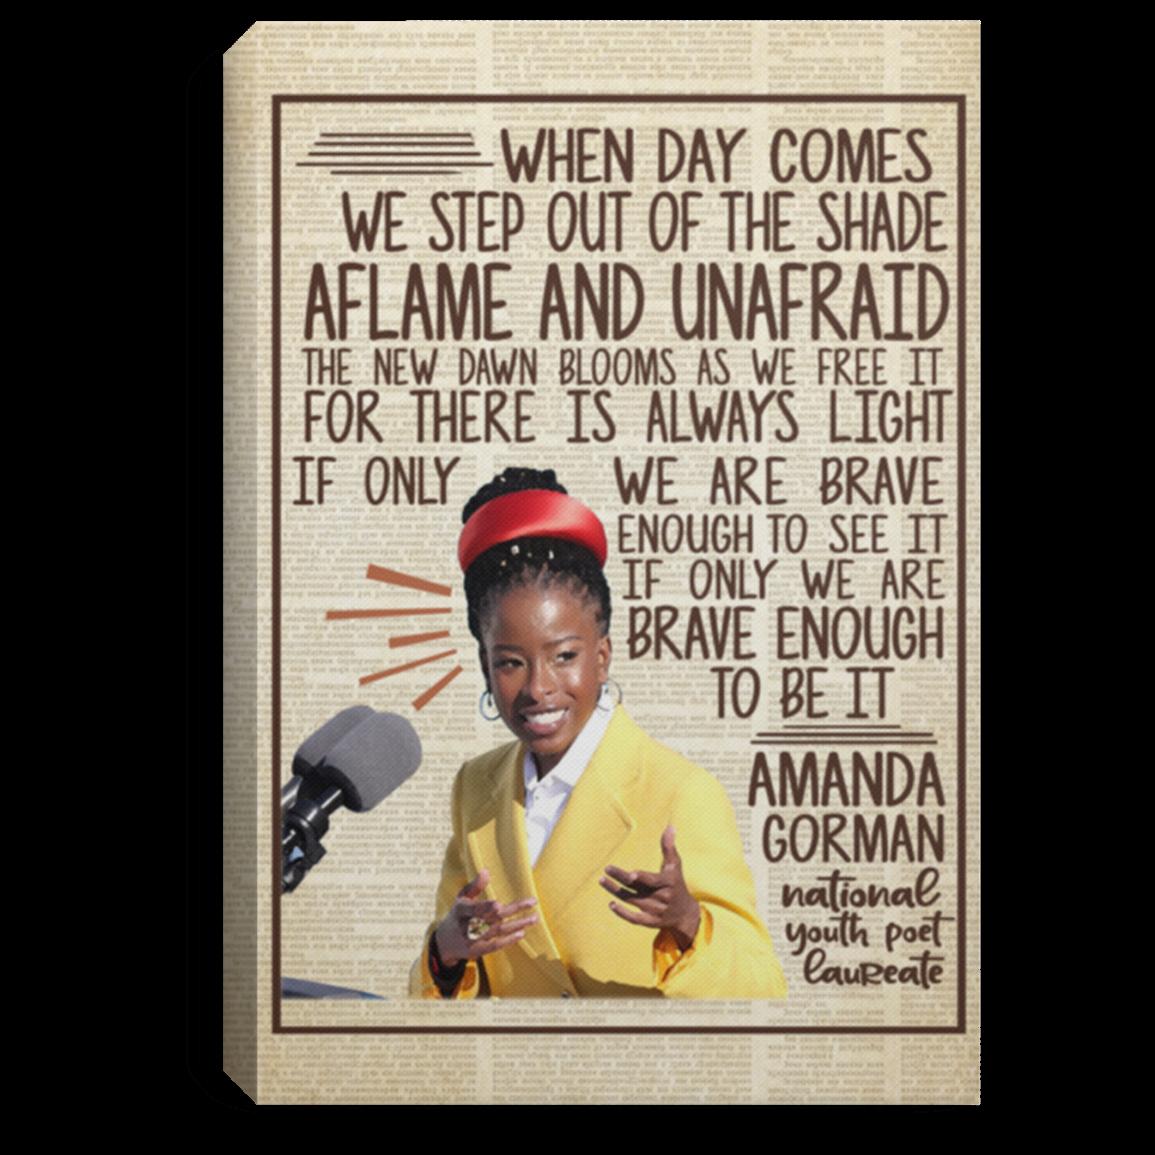 Amanda Gorman Poster Inauguration Poem 2021 Poster Amanda Gorman Feminist Women Rights Print TDP20 Amanda Gorman The Hill We Climb Poster